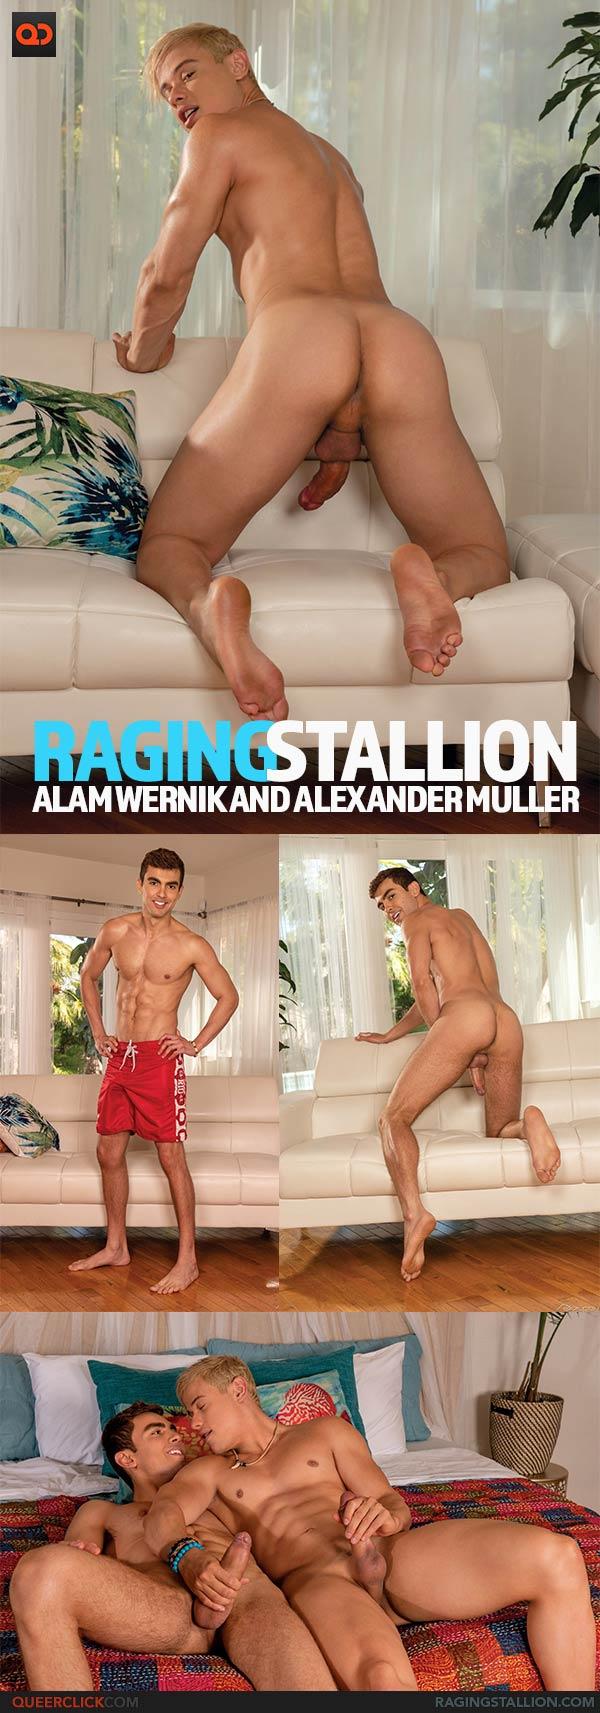 Raging Stallion: Alam Wernik and Alexander Muller